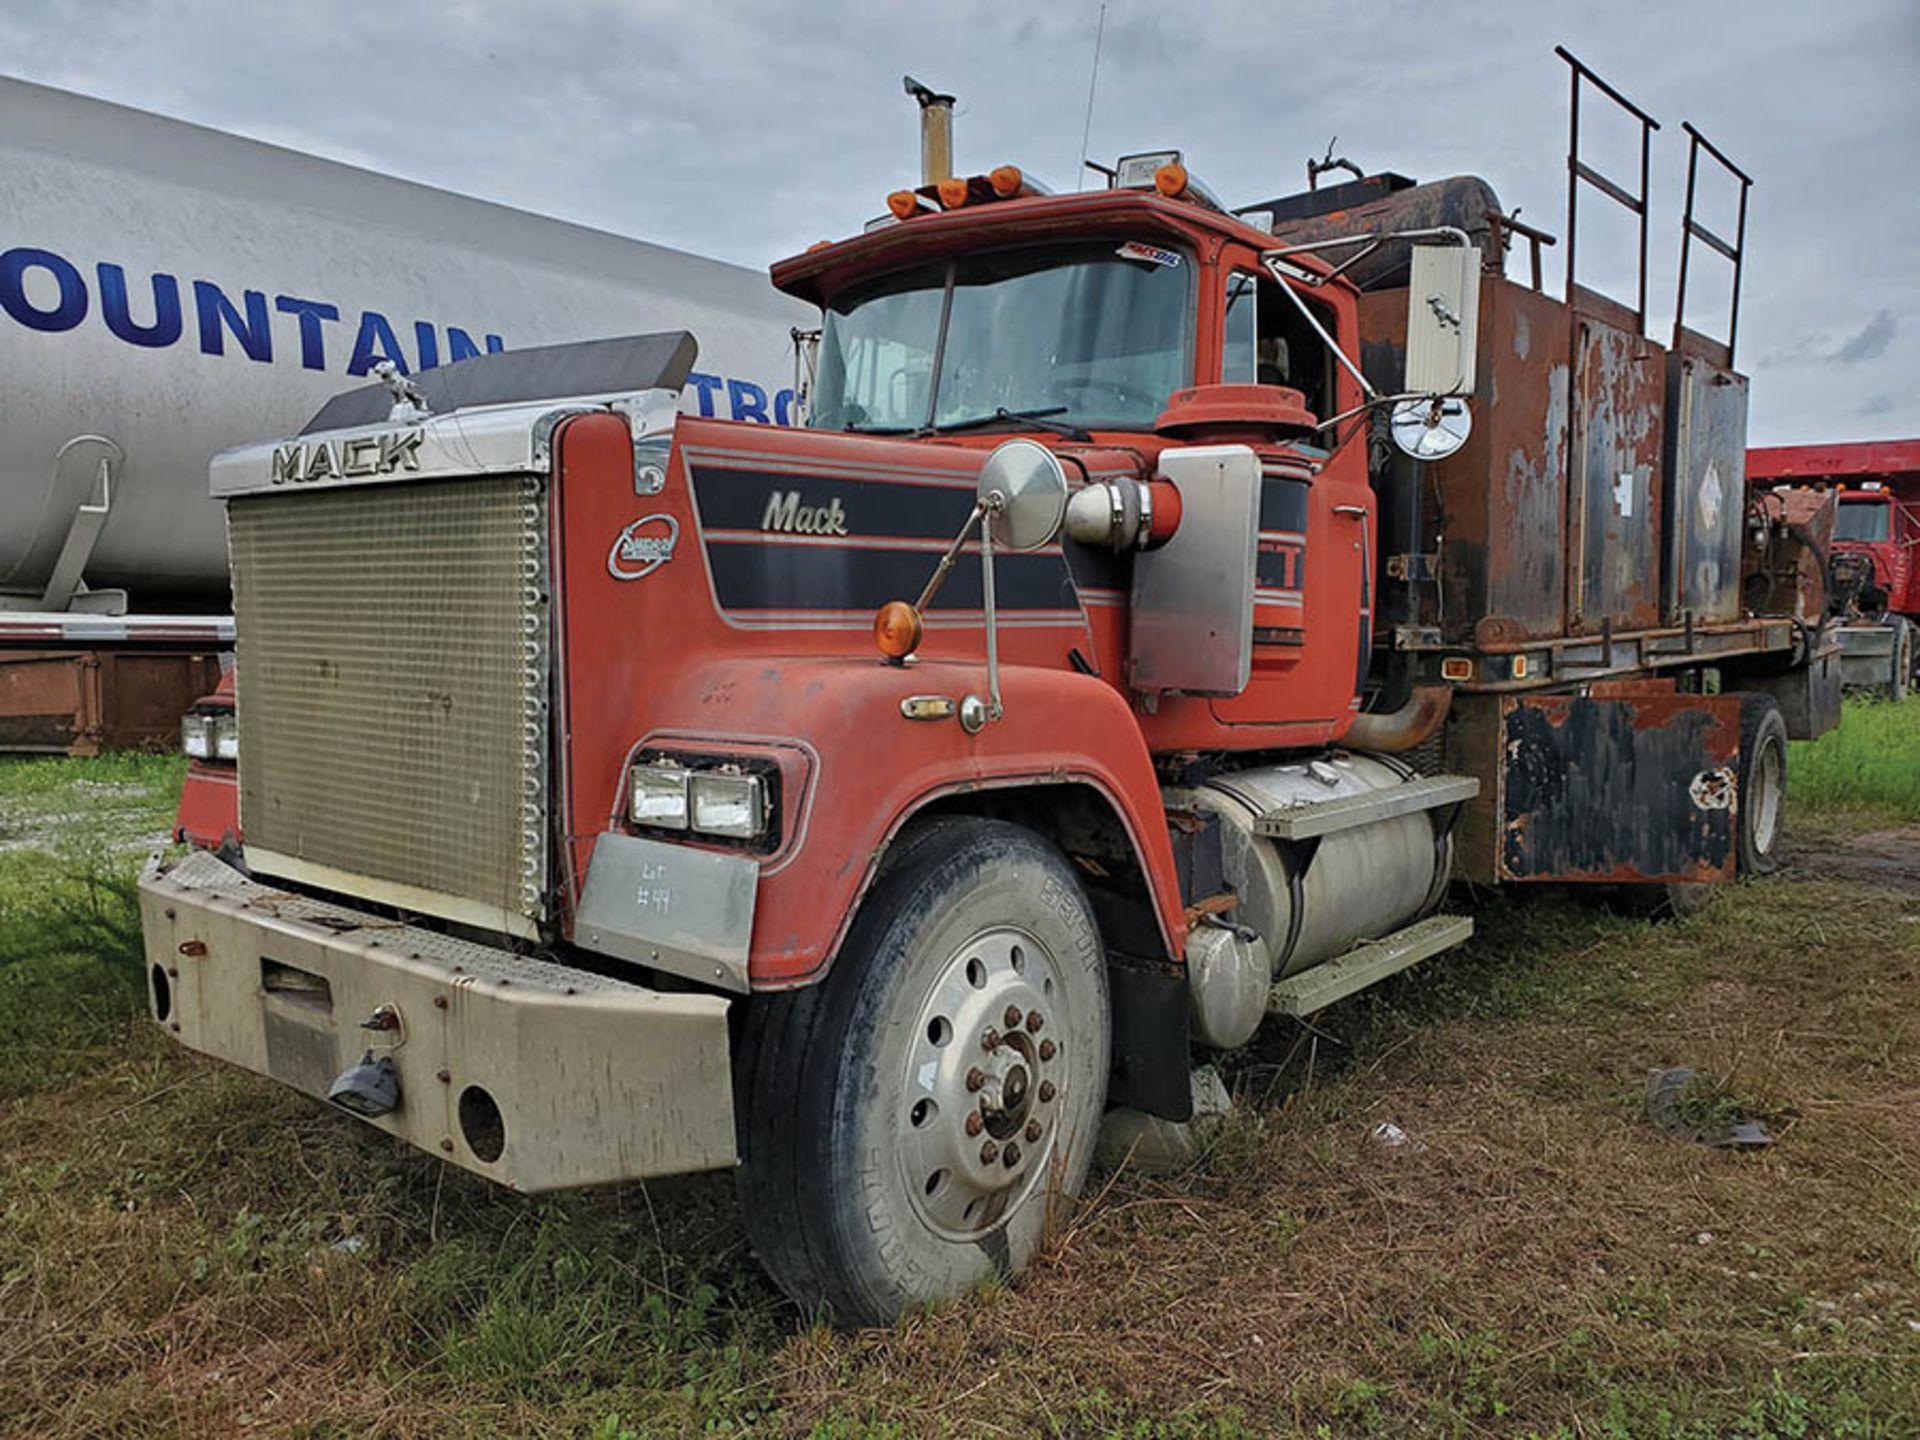 Lot 44 - 1991 MACK RW600 T/A LUBE TRUCK, EATON FULLER TRANSMISSION, MACK INLINE SIX ENGINE, VIN